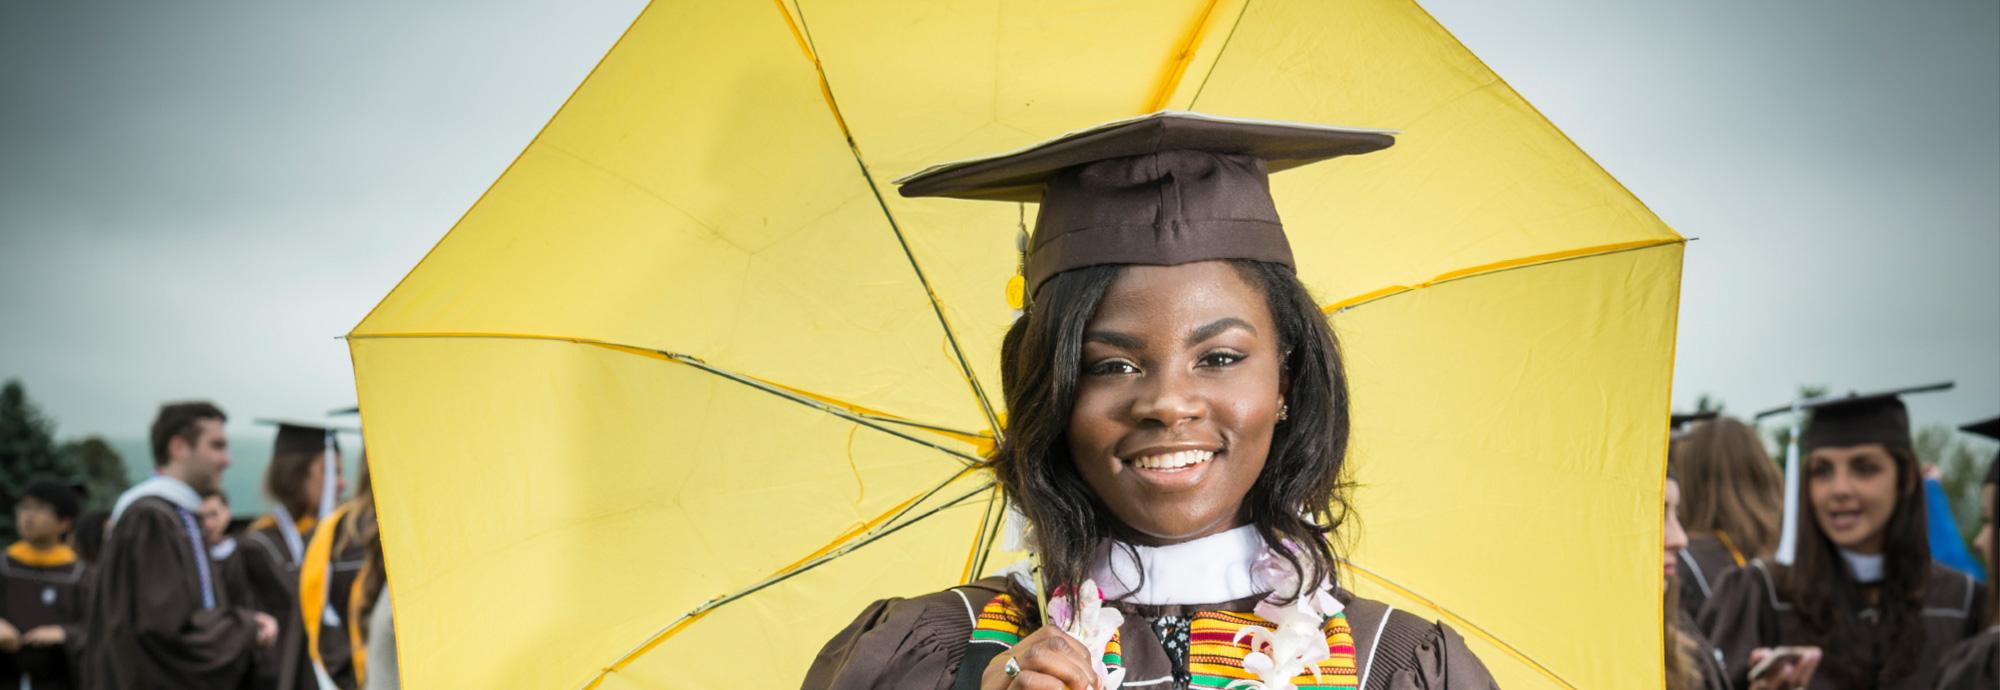 Graduate with an umbrella